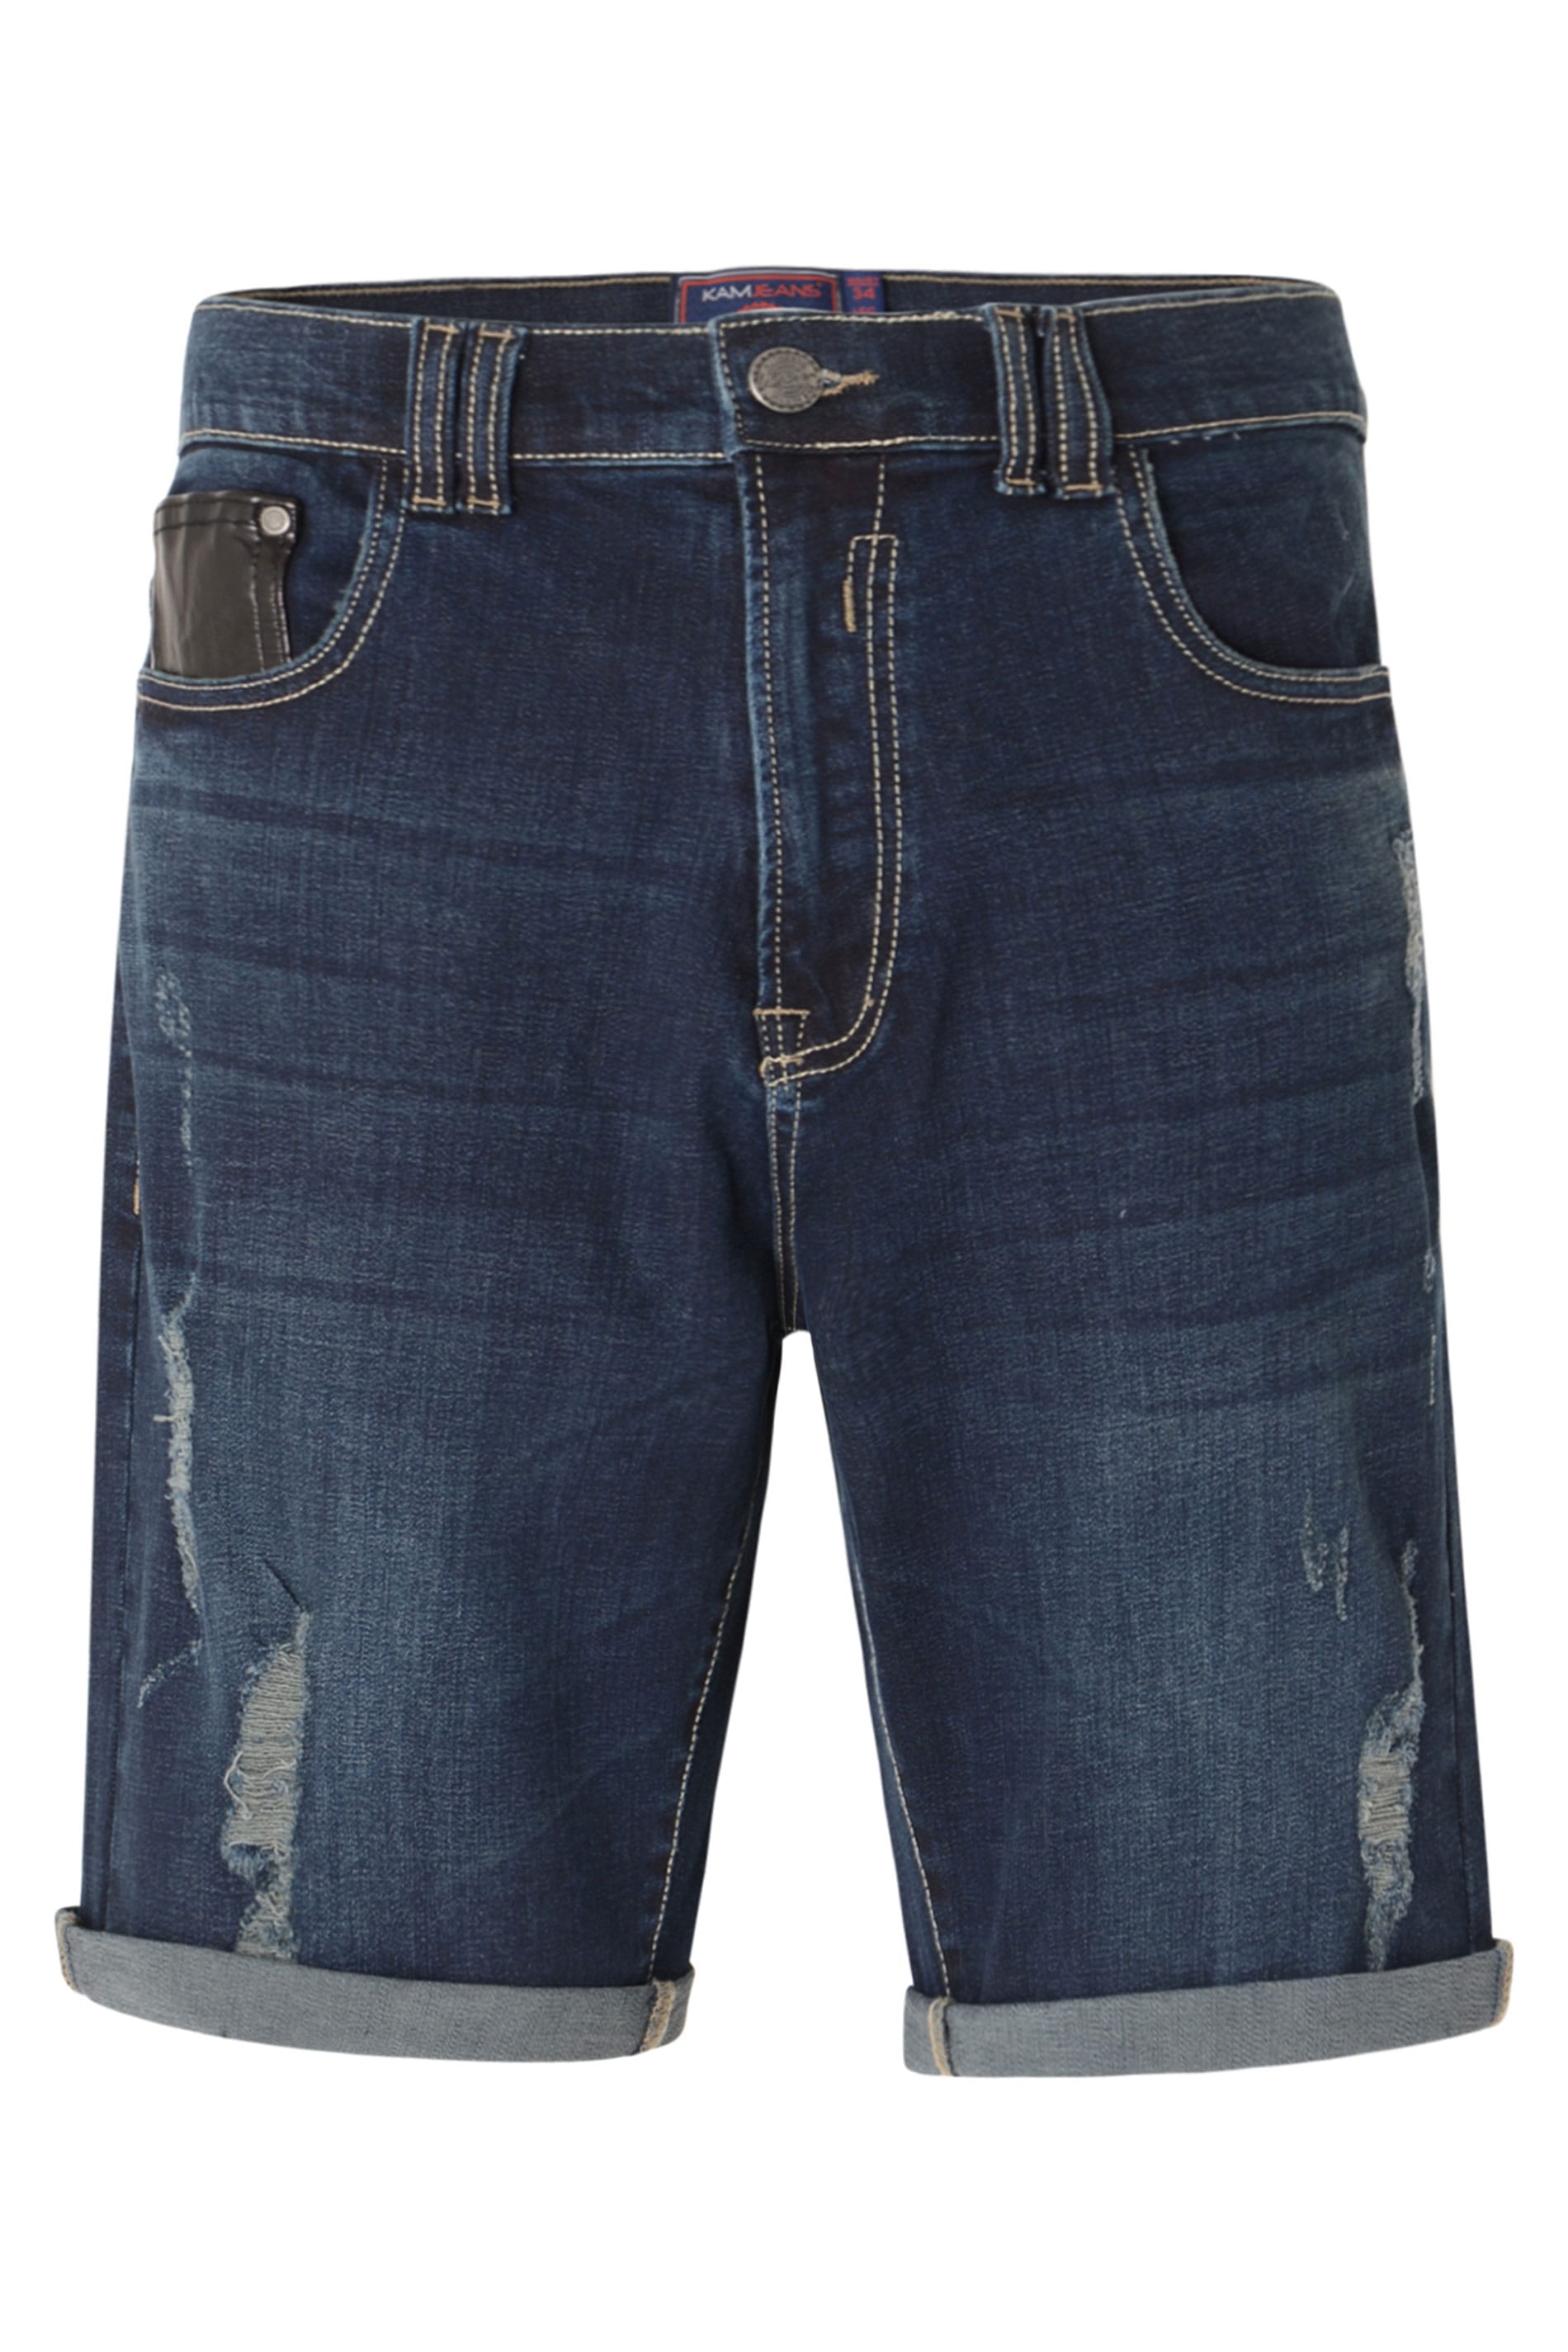 KAM Dark Blue Distressed Denim Shorts_0aa9.jpg